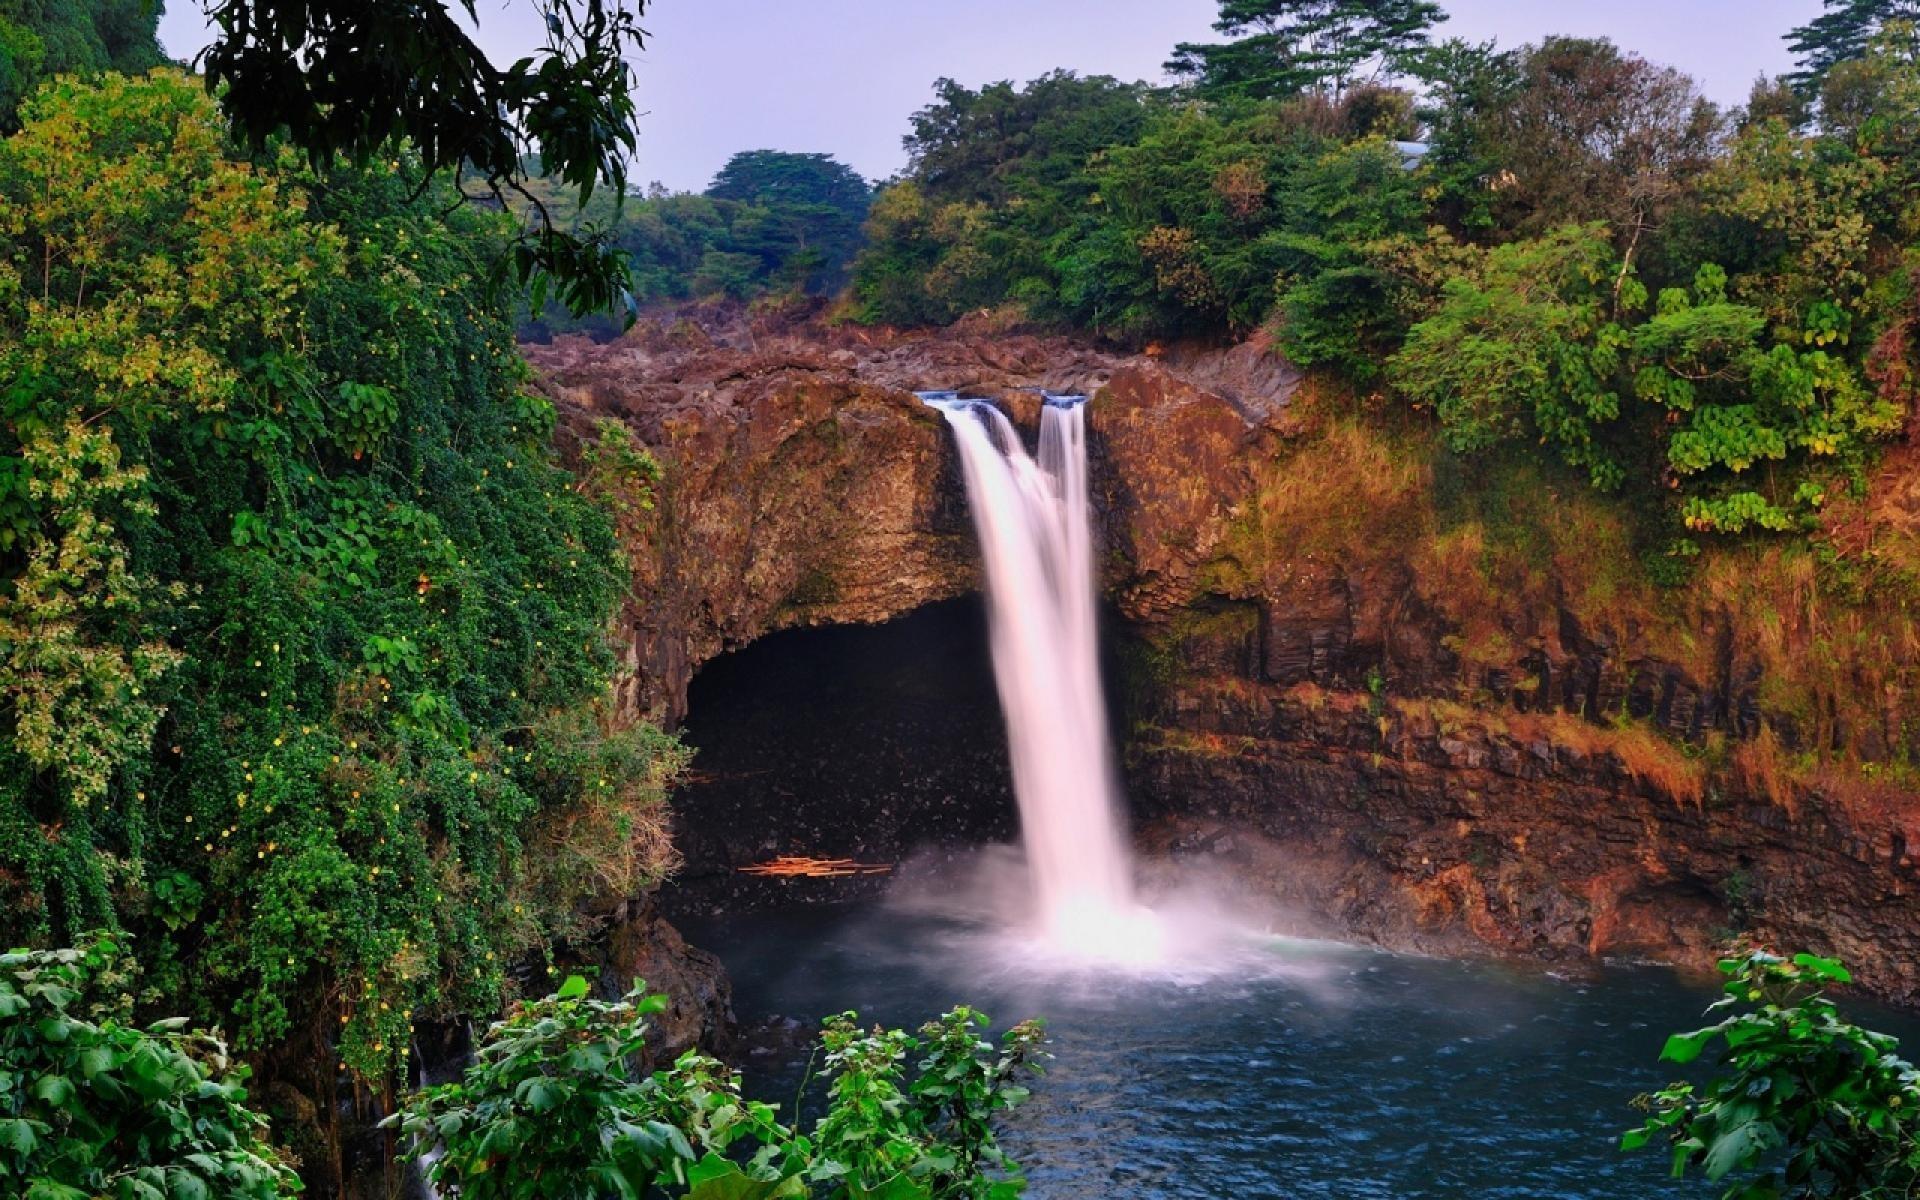 9 Spectacular Hd Waterfall Wallpapers To Download: Spectacular Waterfalls Widescreen Desktop Wallpaper 16